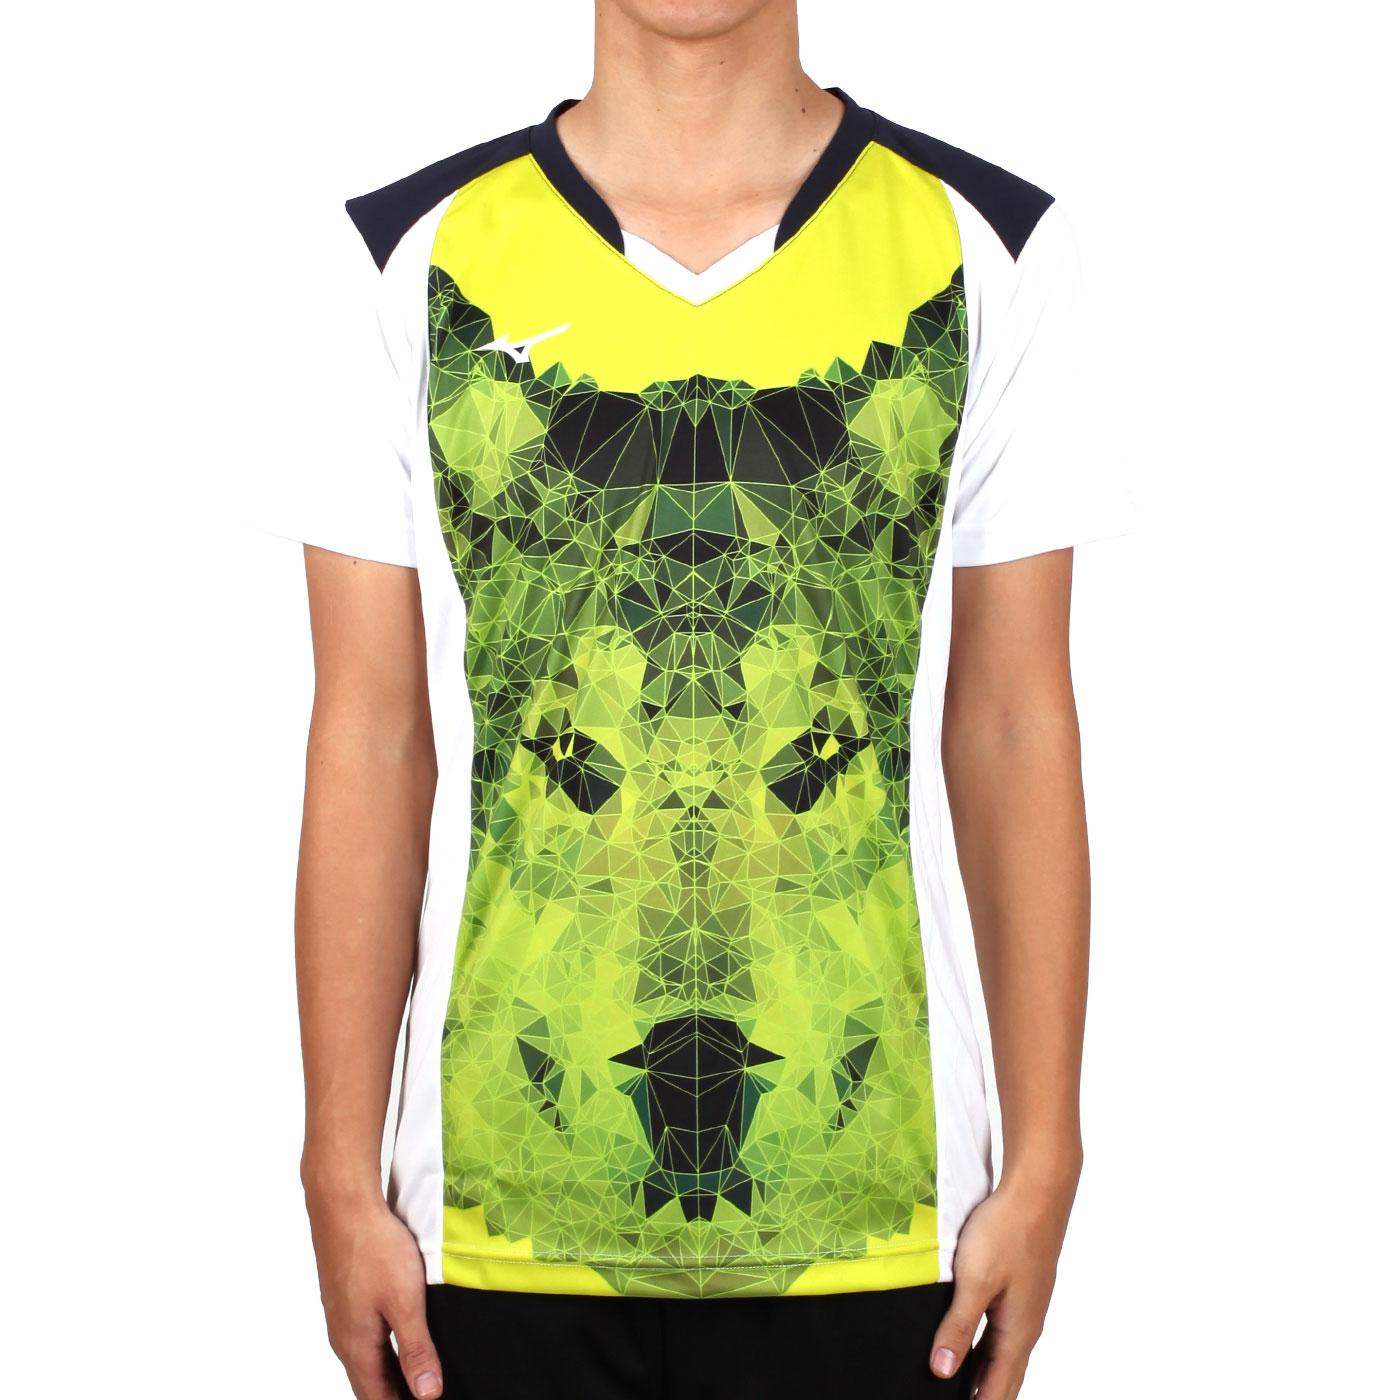 MIZUNO 男排球短袖上衣(2017企業排球聯賽) V2TA7A3081D - 芥末黃黑